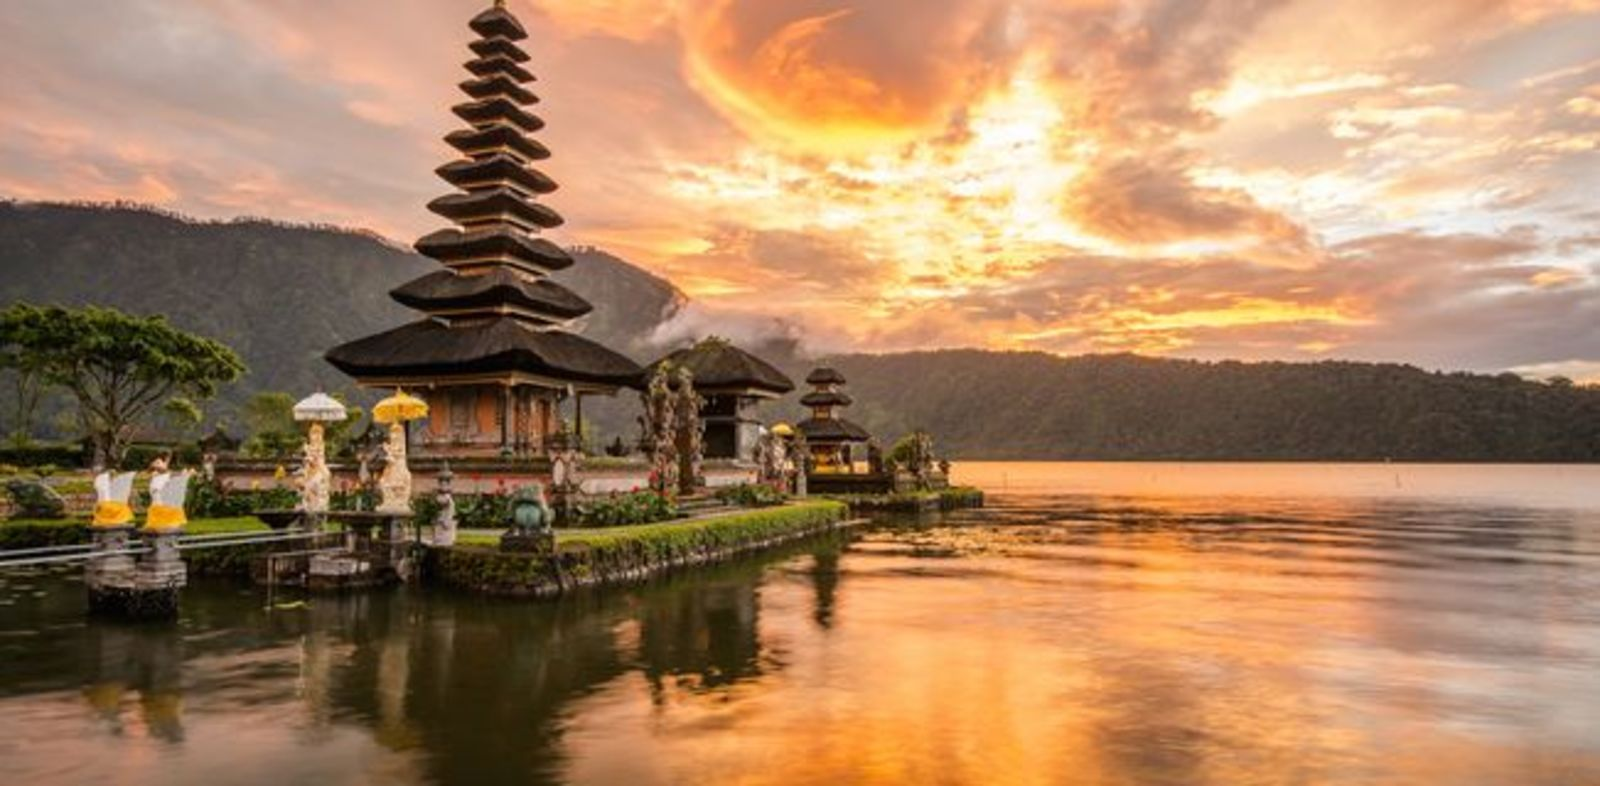 Tempel am Wasser in Bali bei Sonnenuntergang